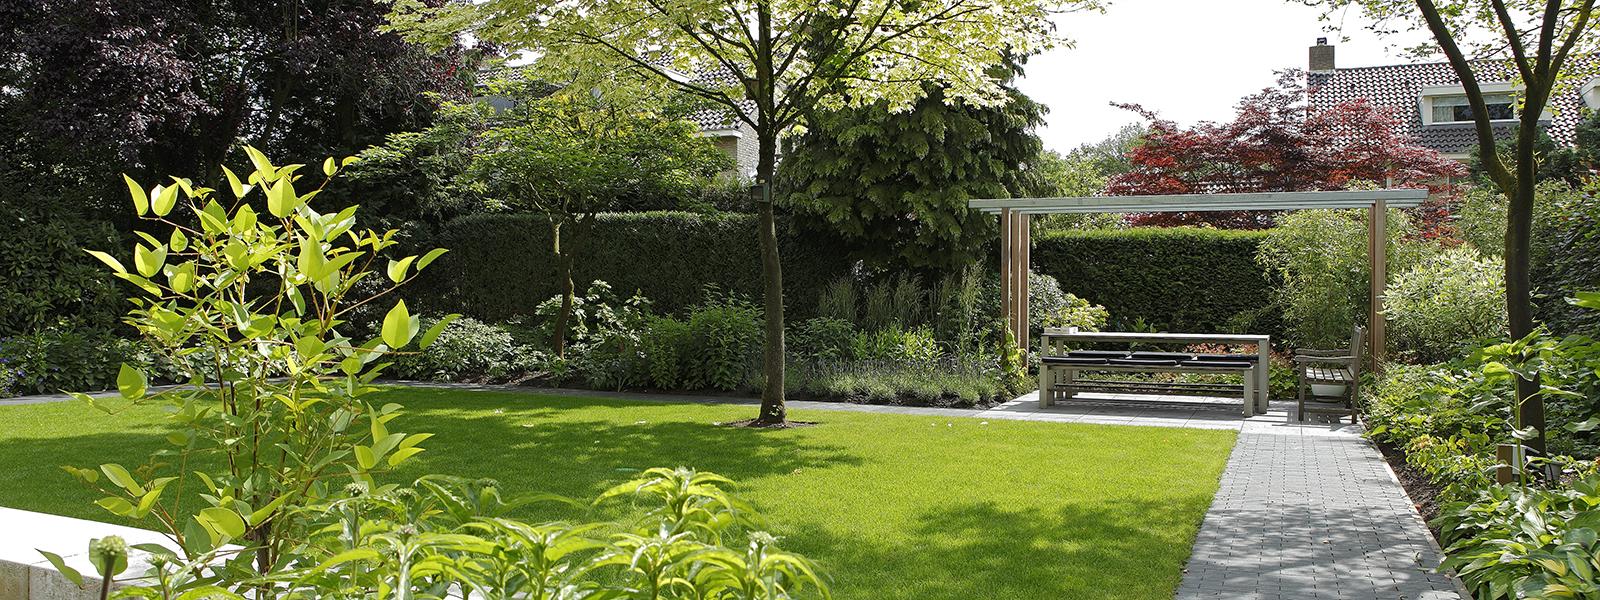 The Art of Living, Exclusief wonen, Soontiëns Hoveniers, villa, tuin, moderne tuin, strakke tuinarchitectuur, gras, villawijk